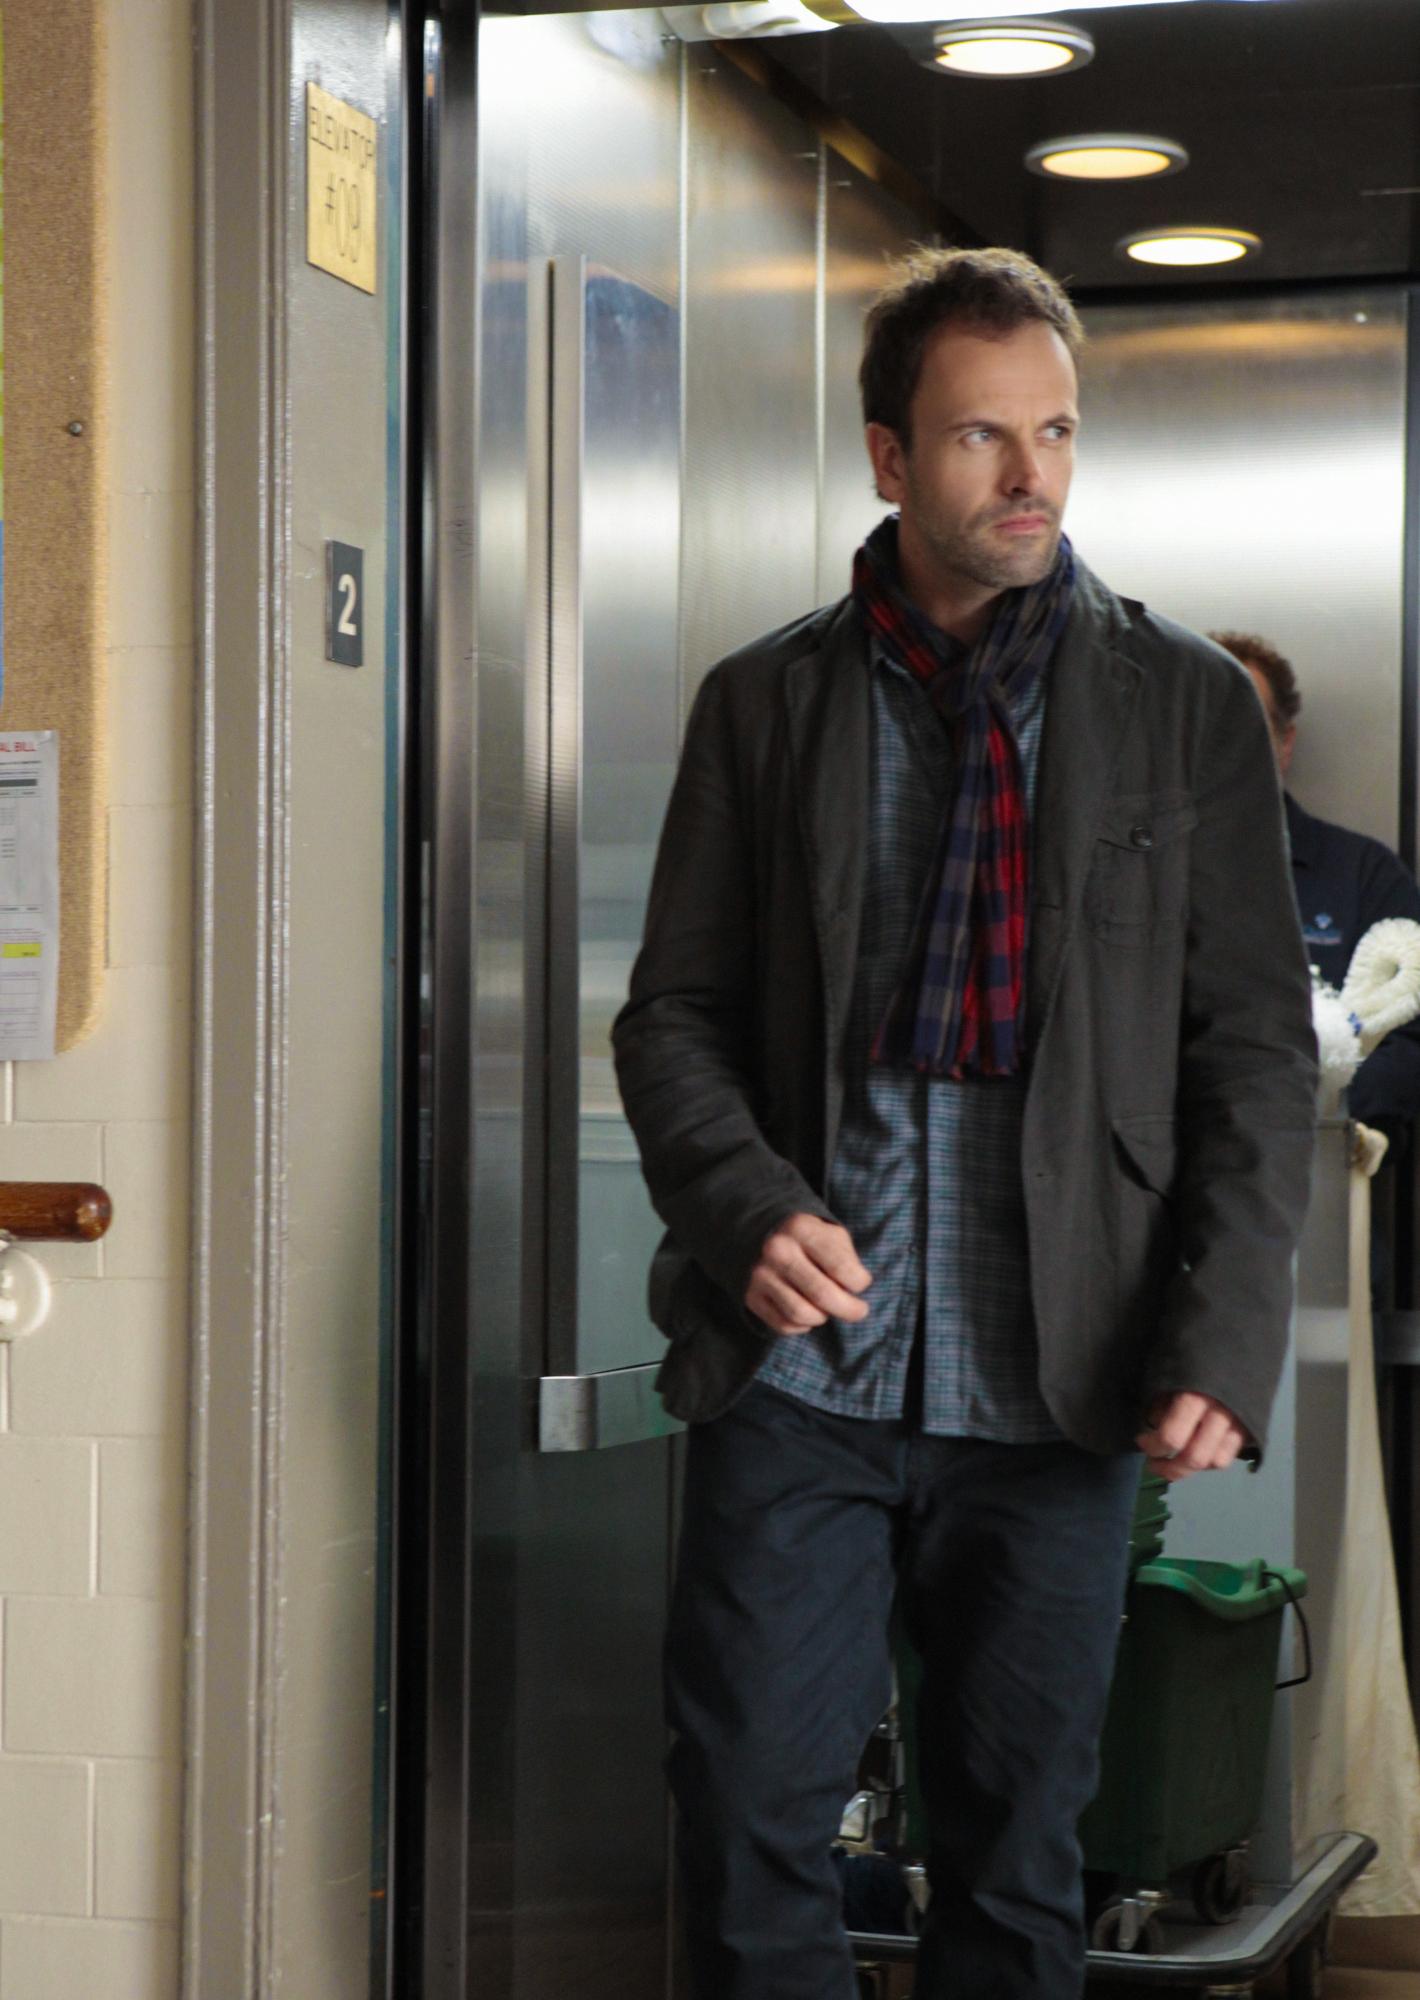 Sherlock at the Hospital